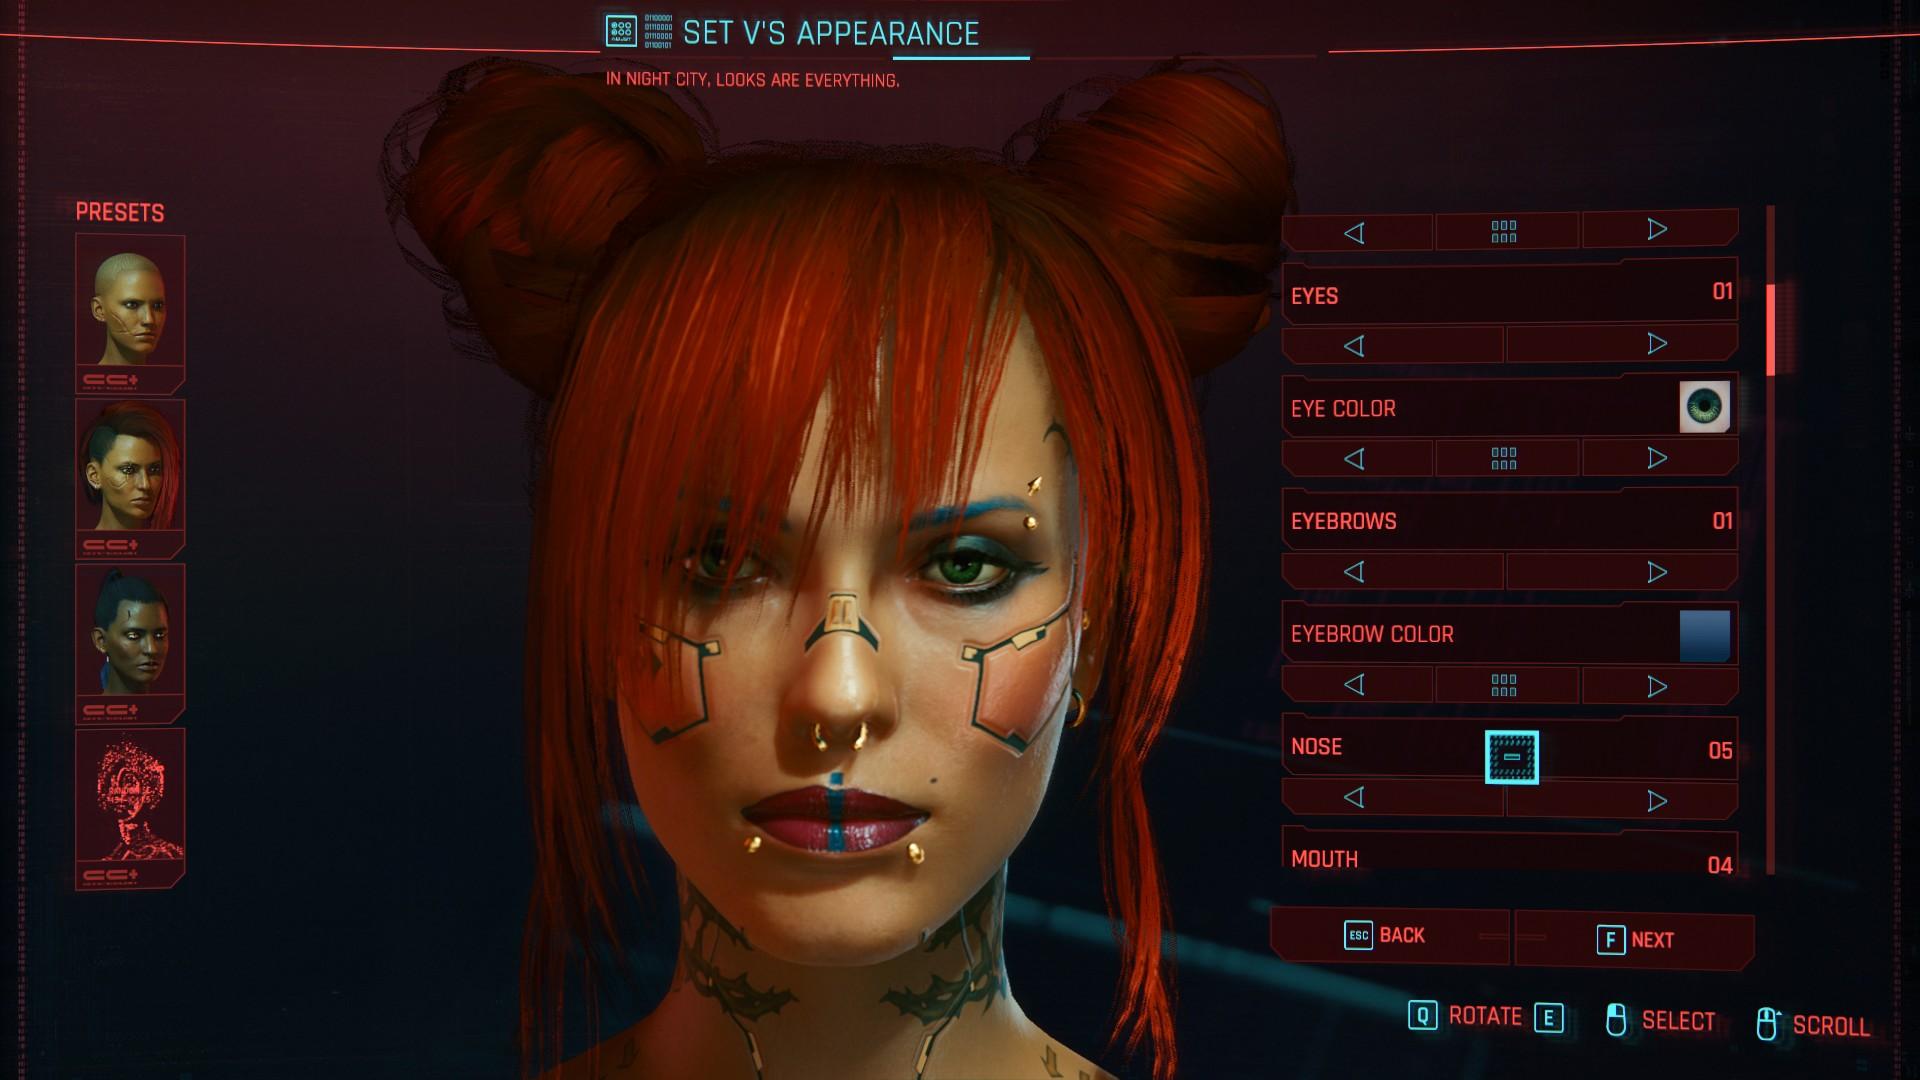 Cyberpunk 2077 (C) 2020 by CD Projekt RED 10_12_2020 06_05_58 PM.jpg